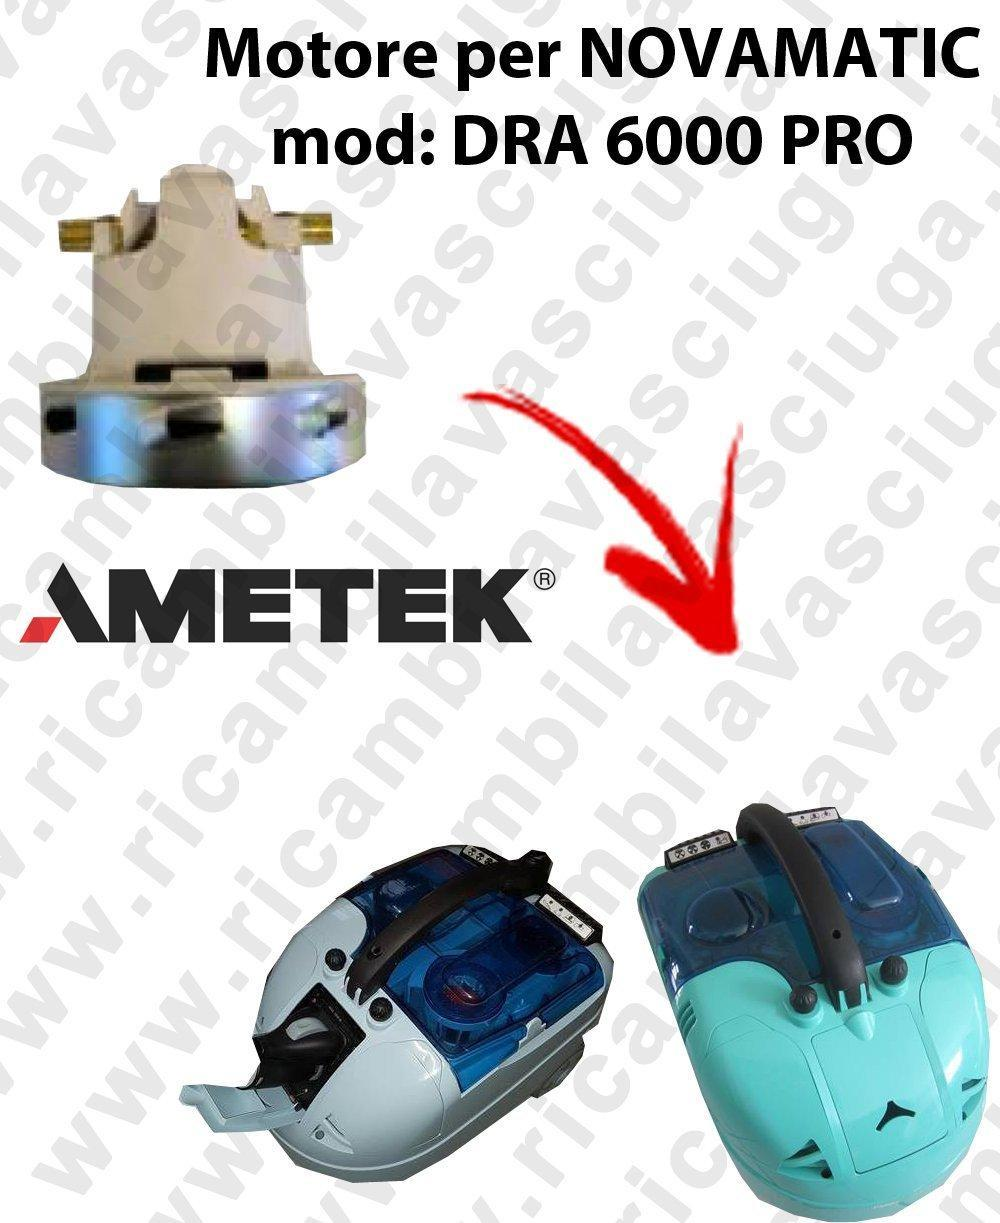 DRA 6000 PRO Saugmotor AMETEK für Staubsauger NOVAMATIC